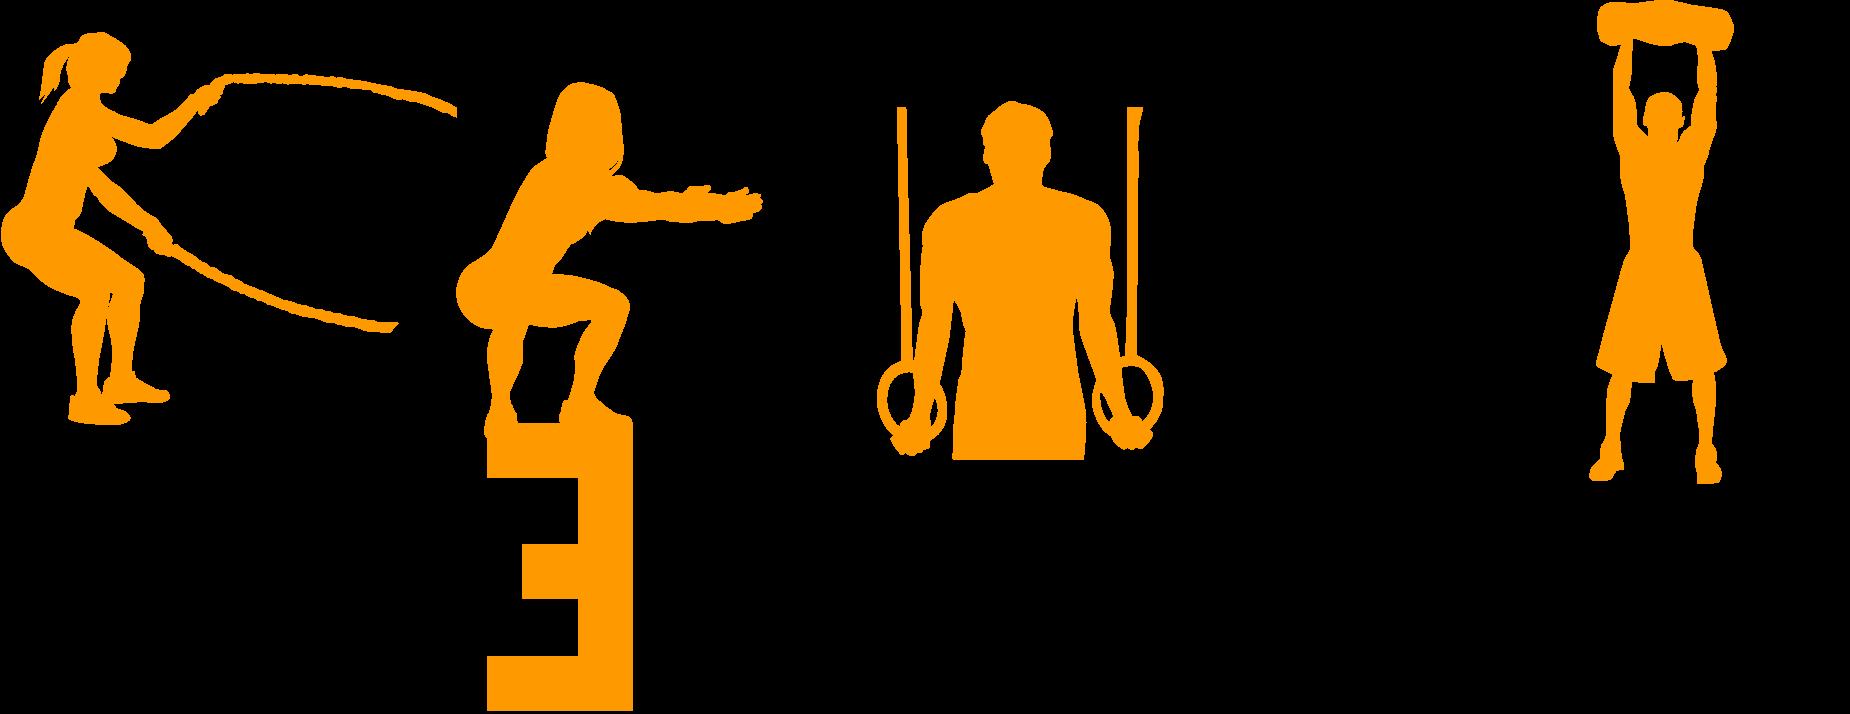 Logo complet noir   leveladdict